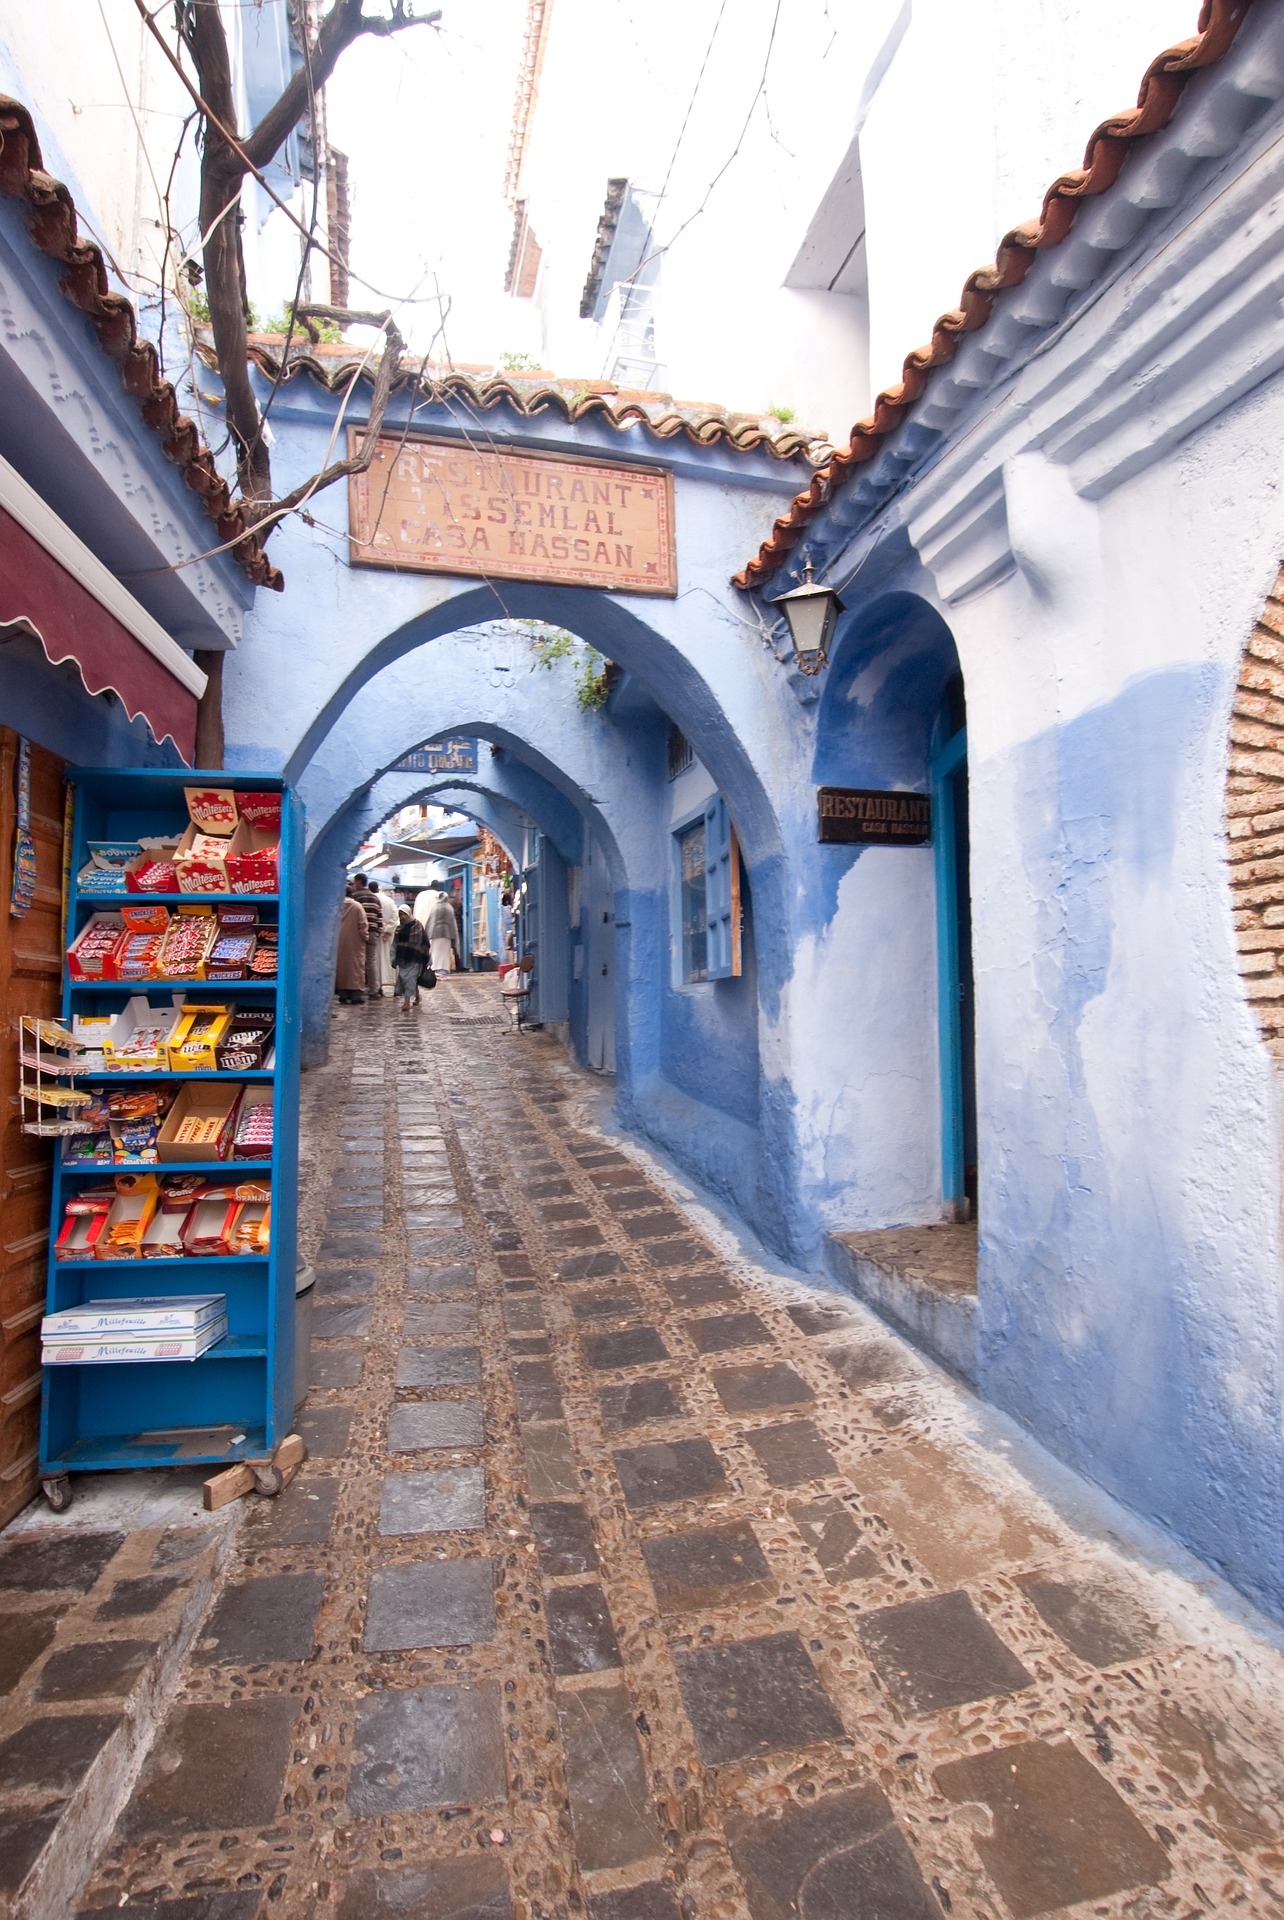 marocco in macchina - Forum Marocco - Tripadvisor